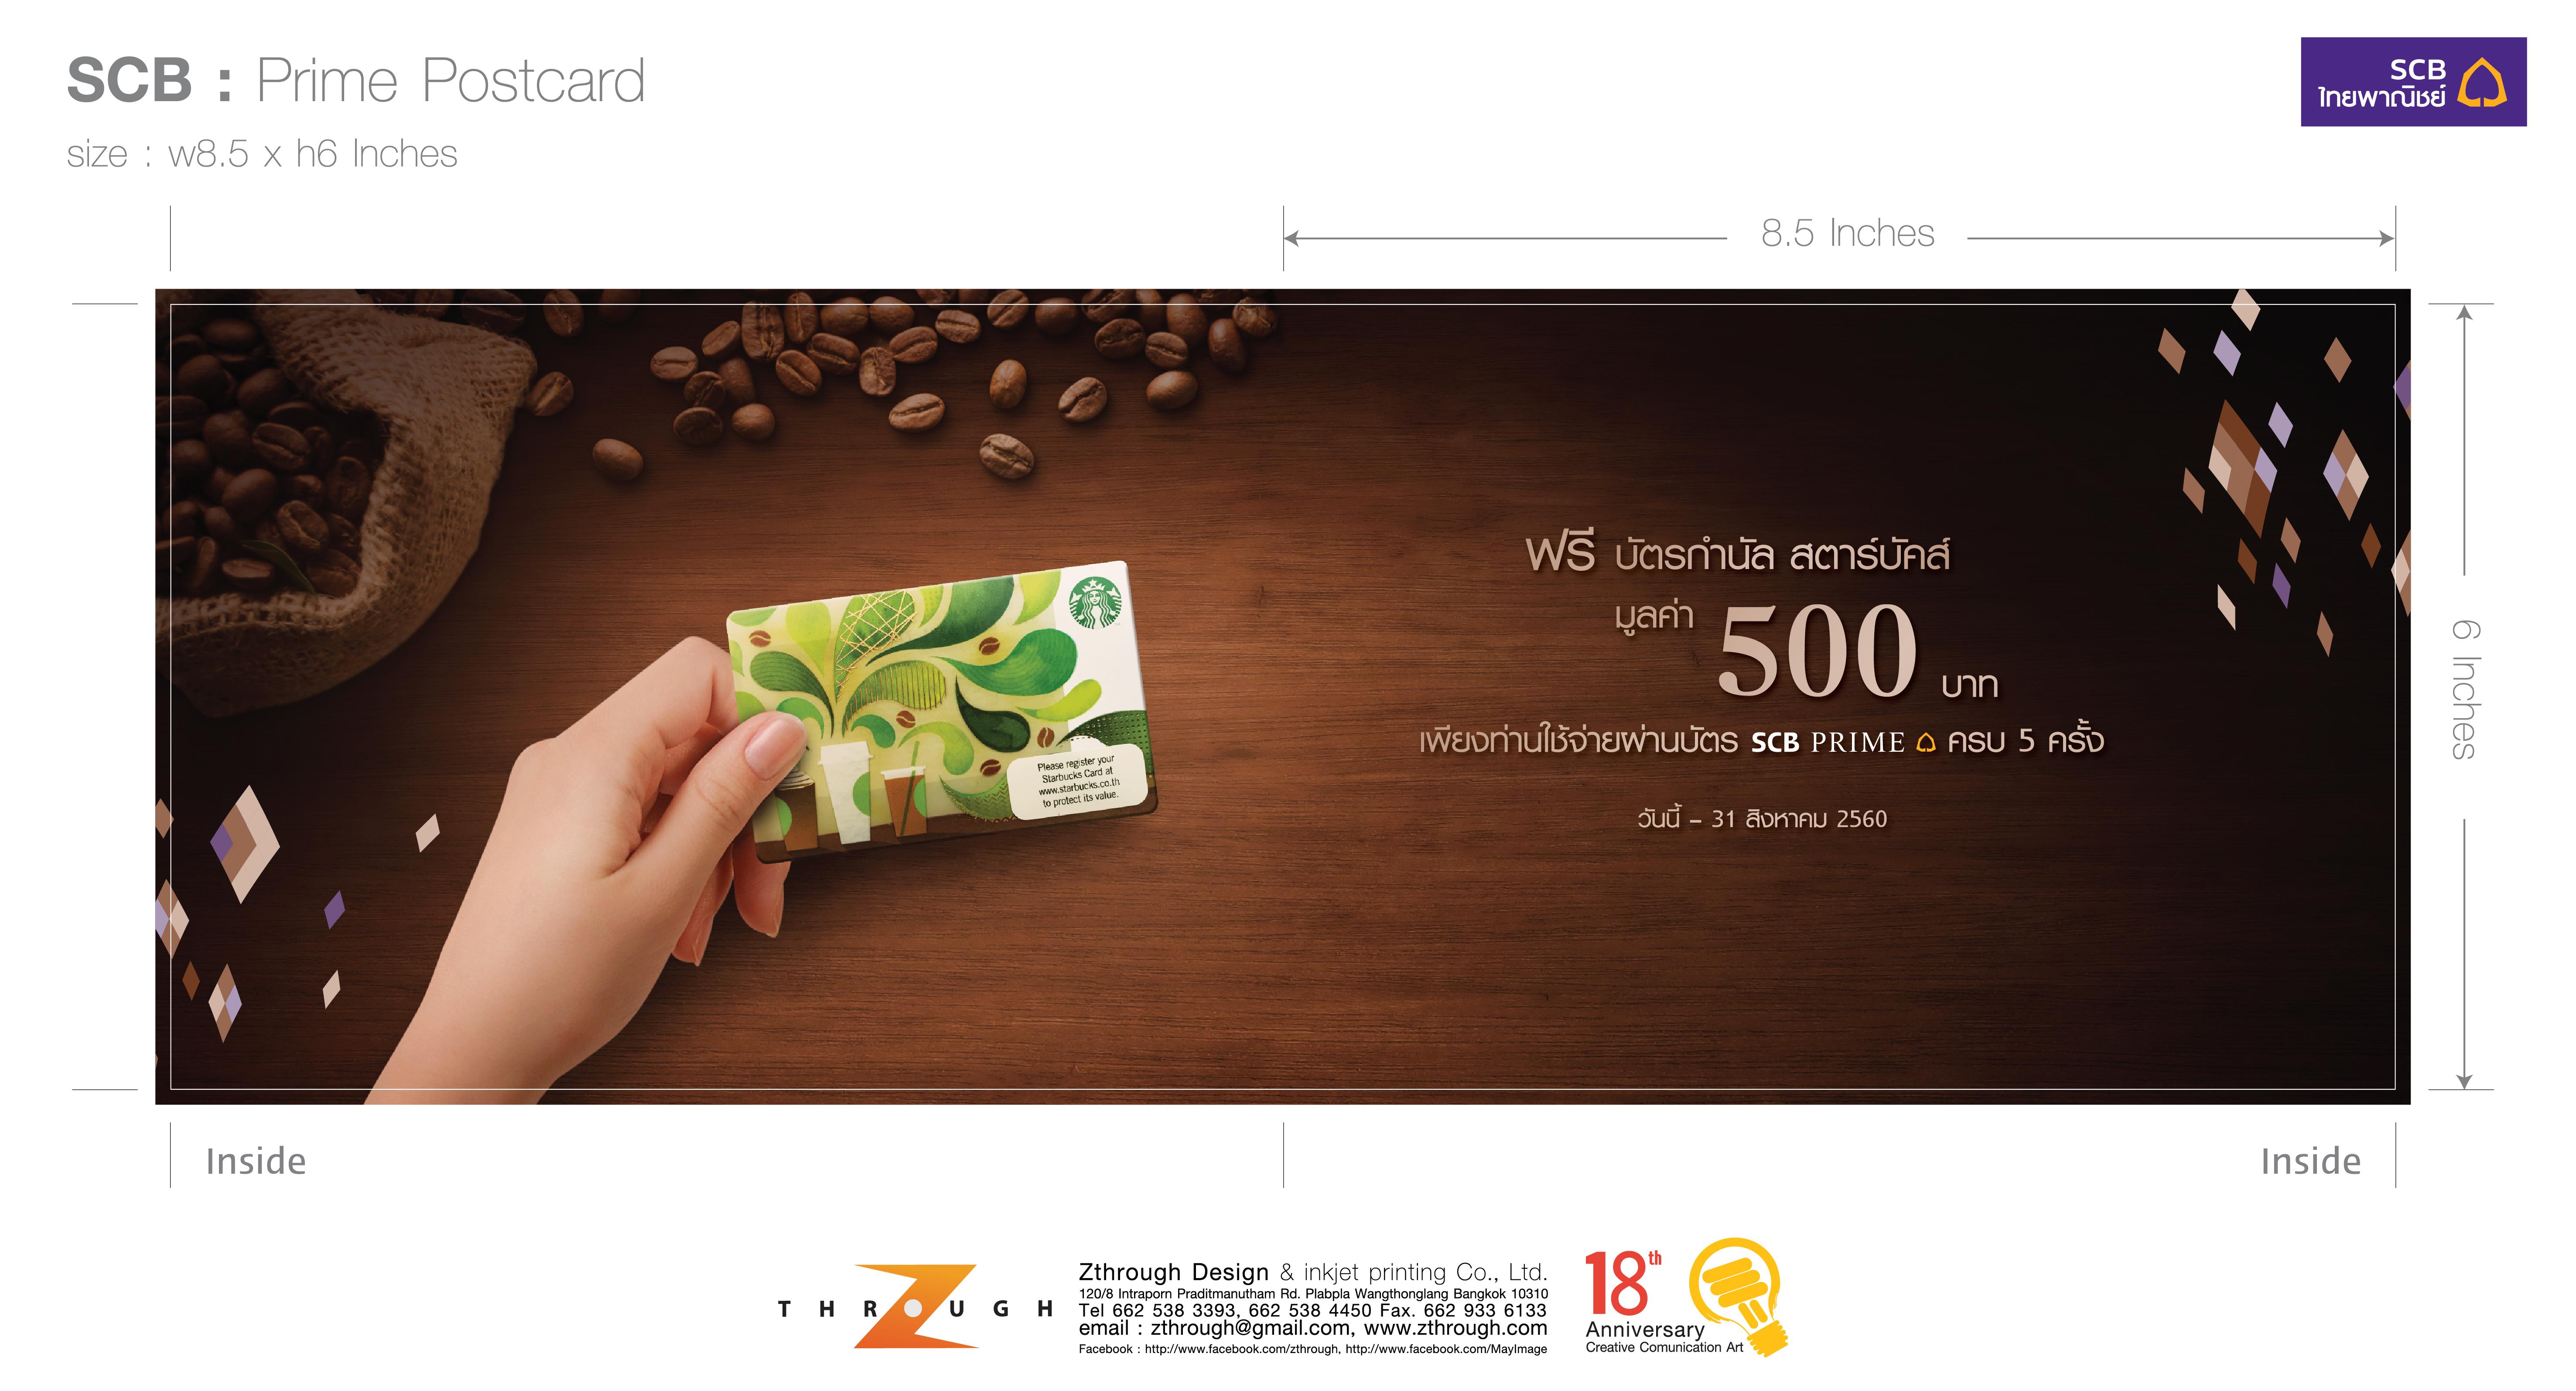 AW_SCB_Prime PostCard_OL-02